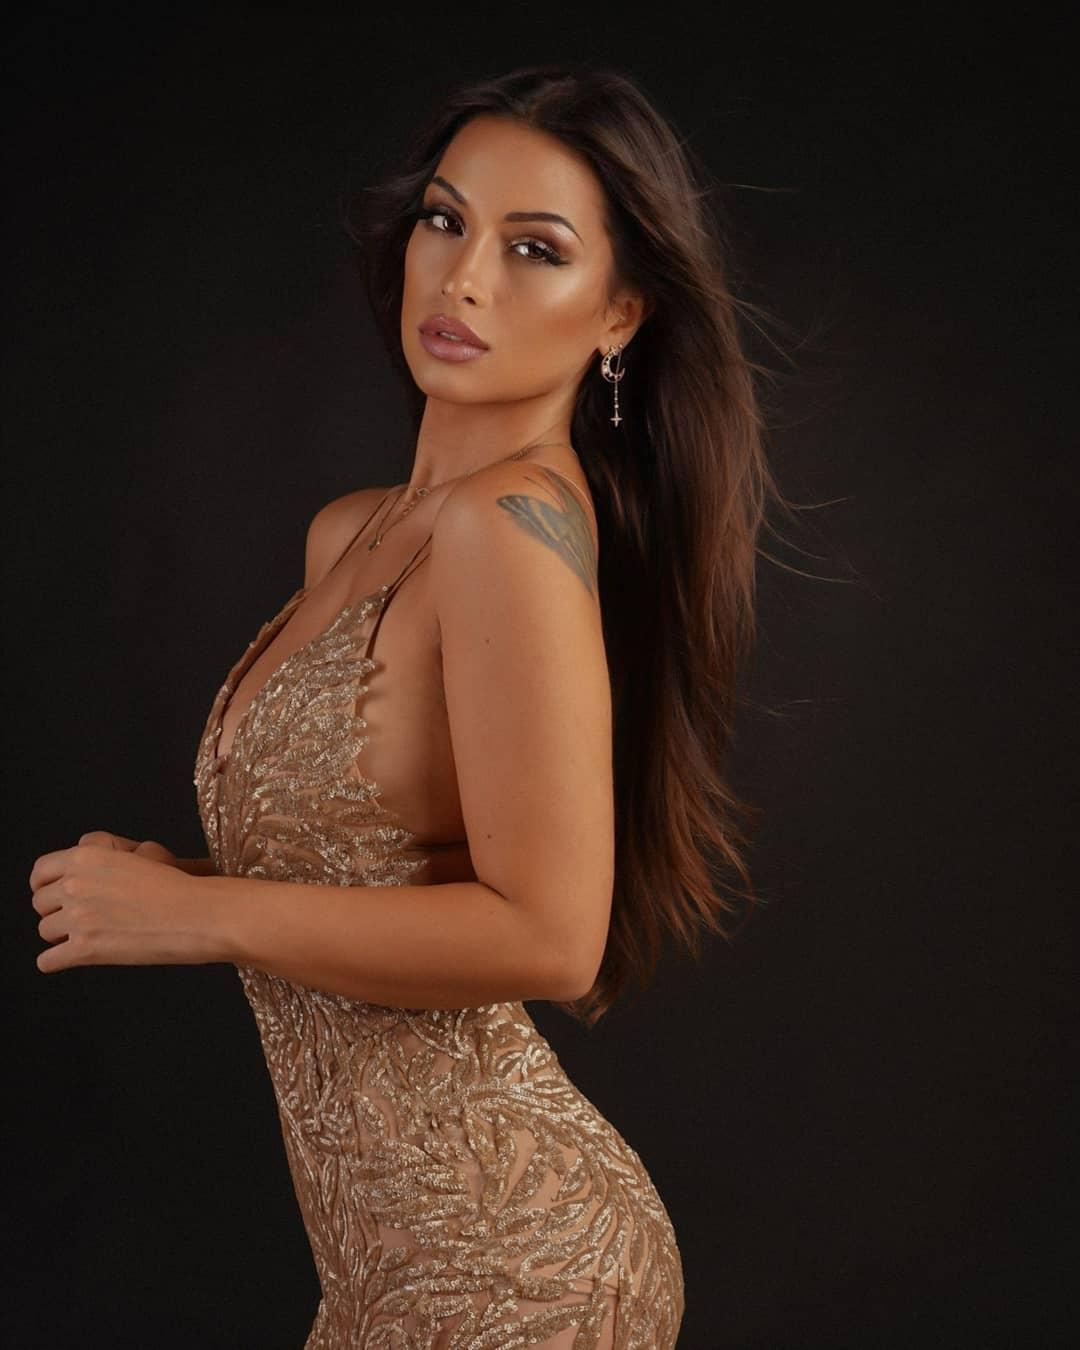 Alessia-Spagnulo-Wallpapers-Insta-Fit-Bio-2